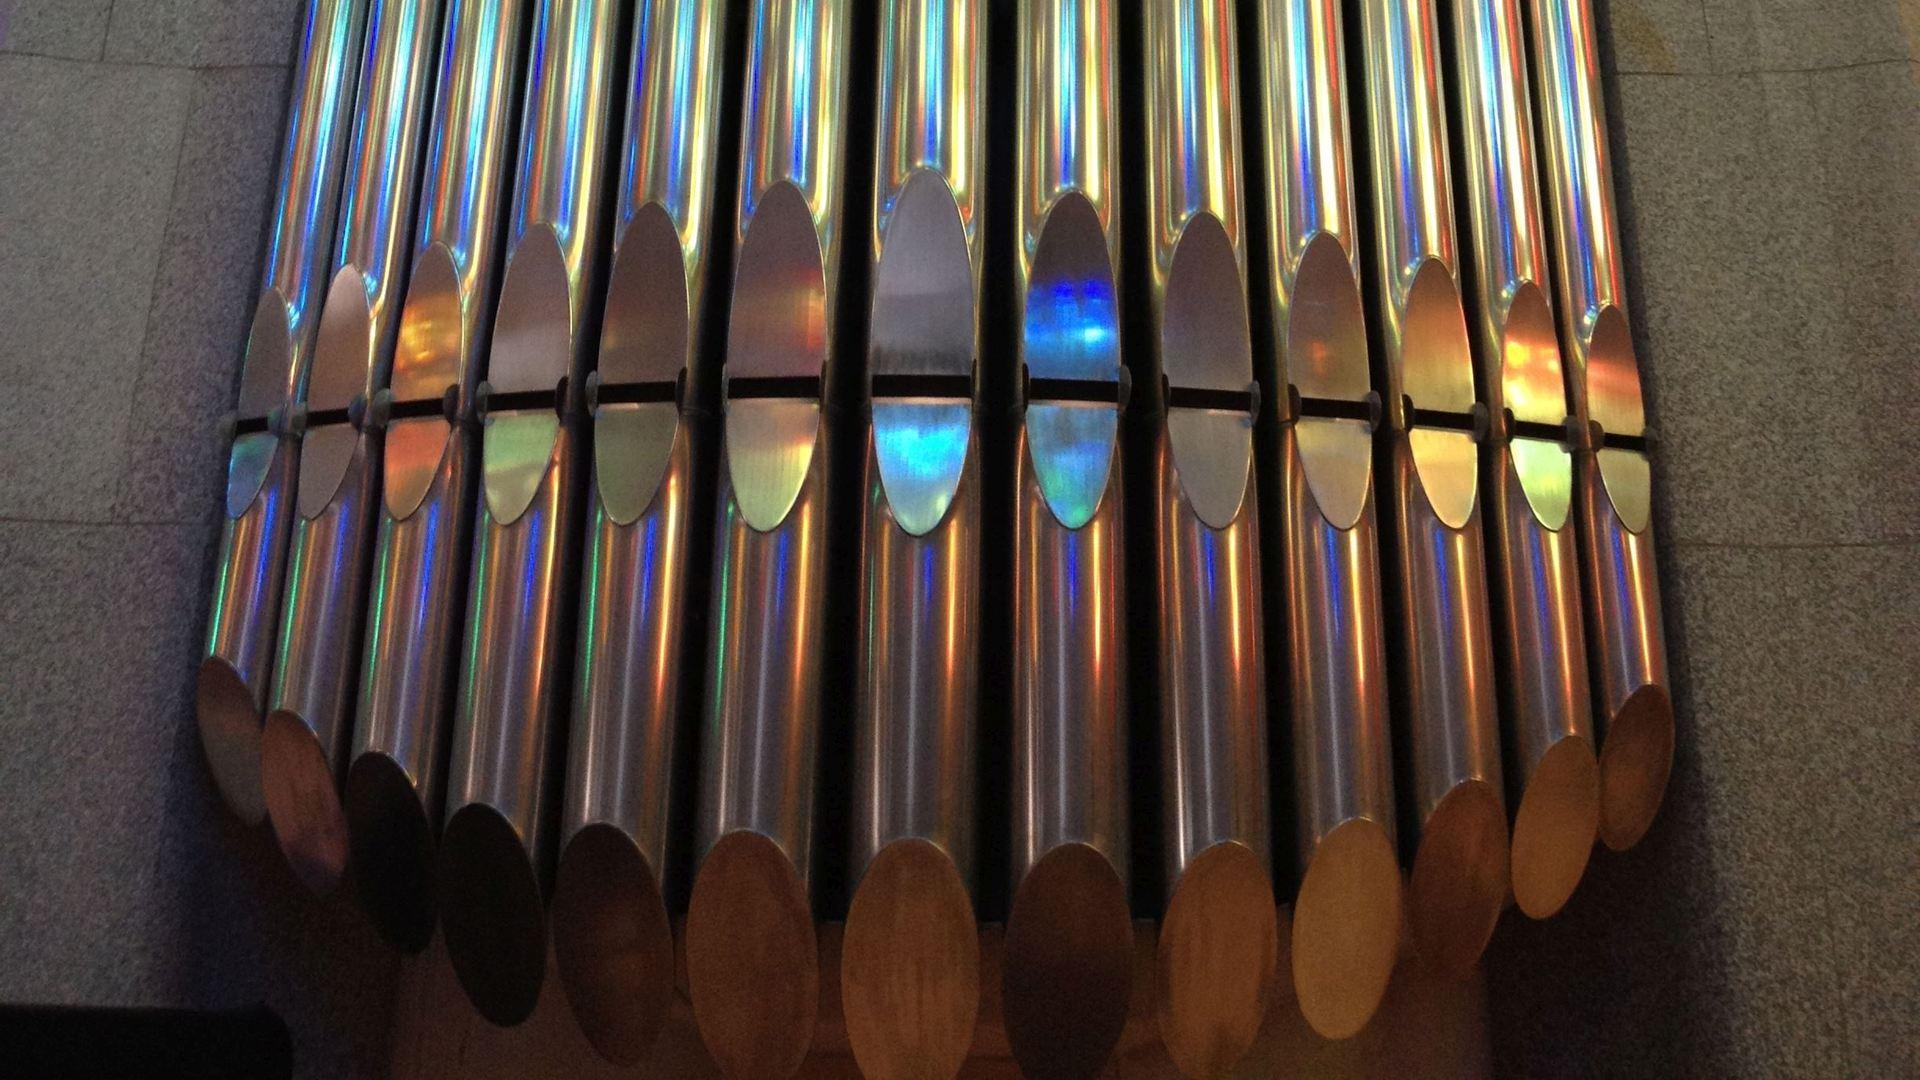 WallpaperFusion-organ-pipes-sagrada-familia-barcelona-Original-1920x1080.jpg